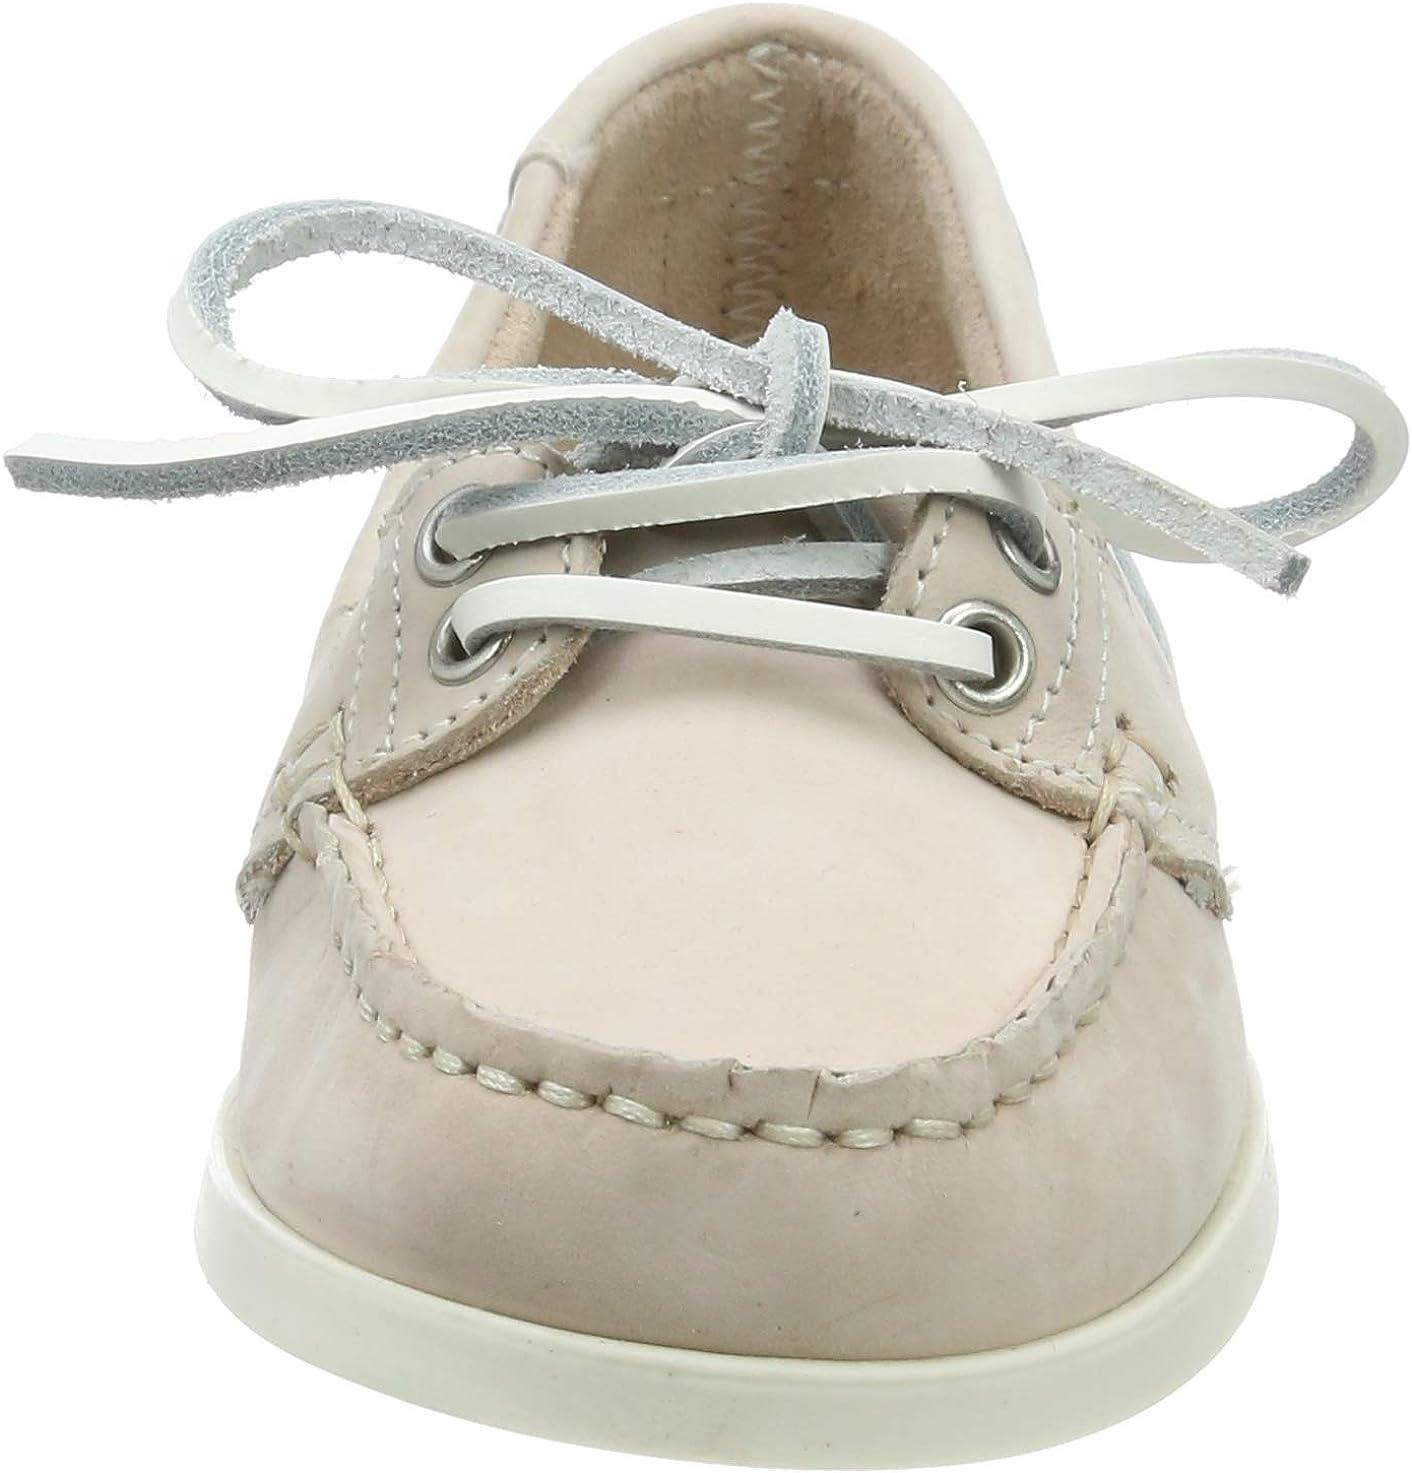 Chatham Womens Harper Boat Shoes